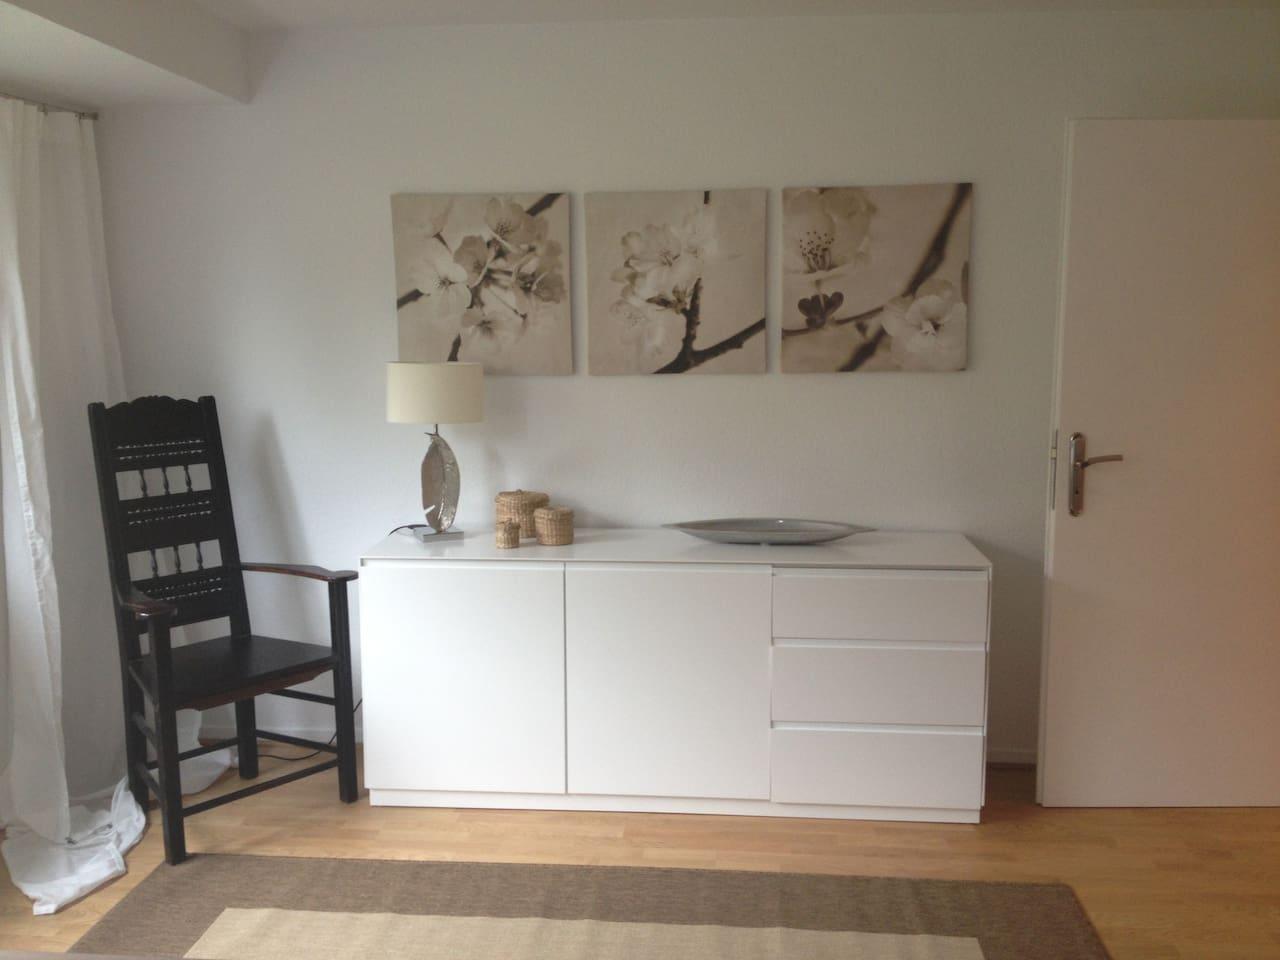 the roomchen*Schlafzimmer - bedroom